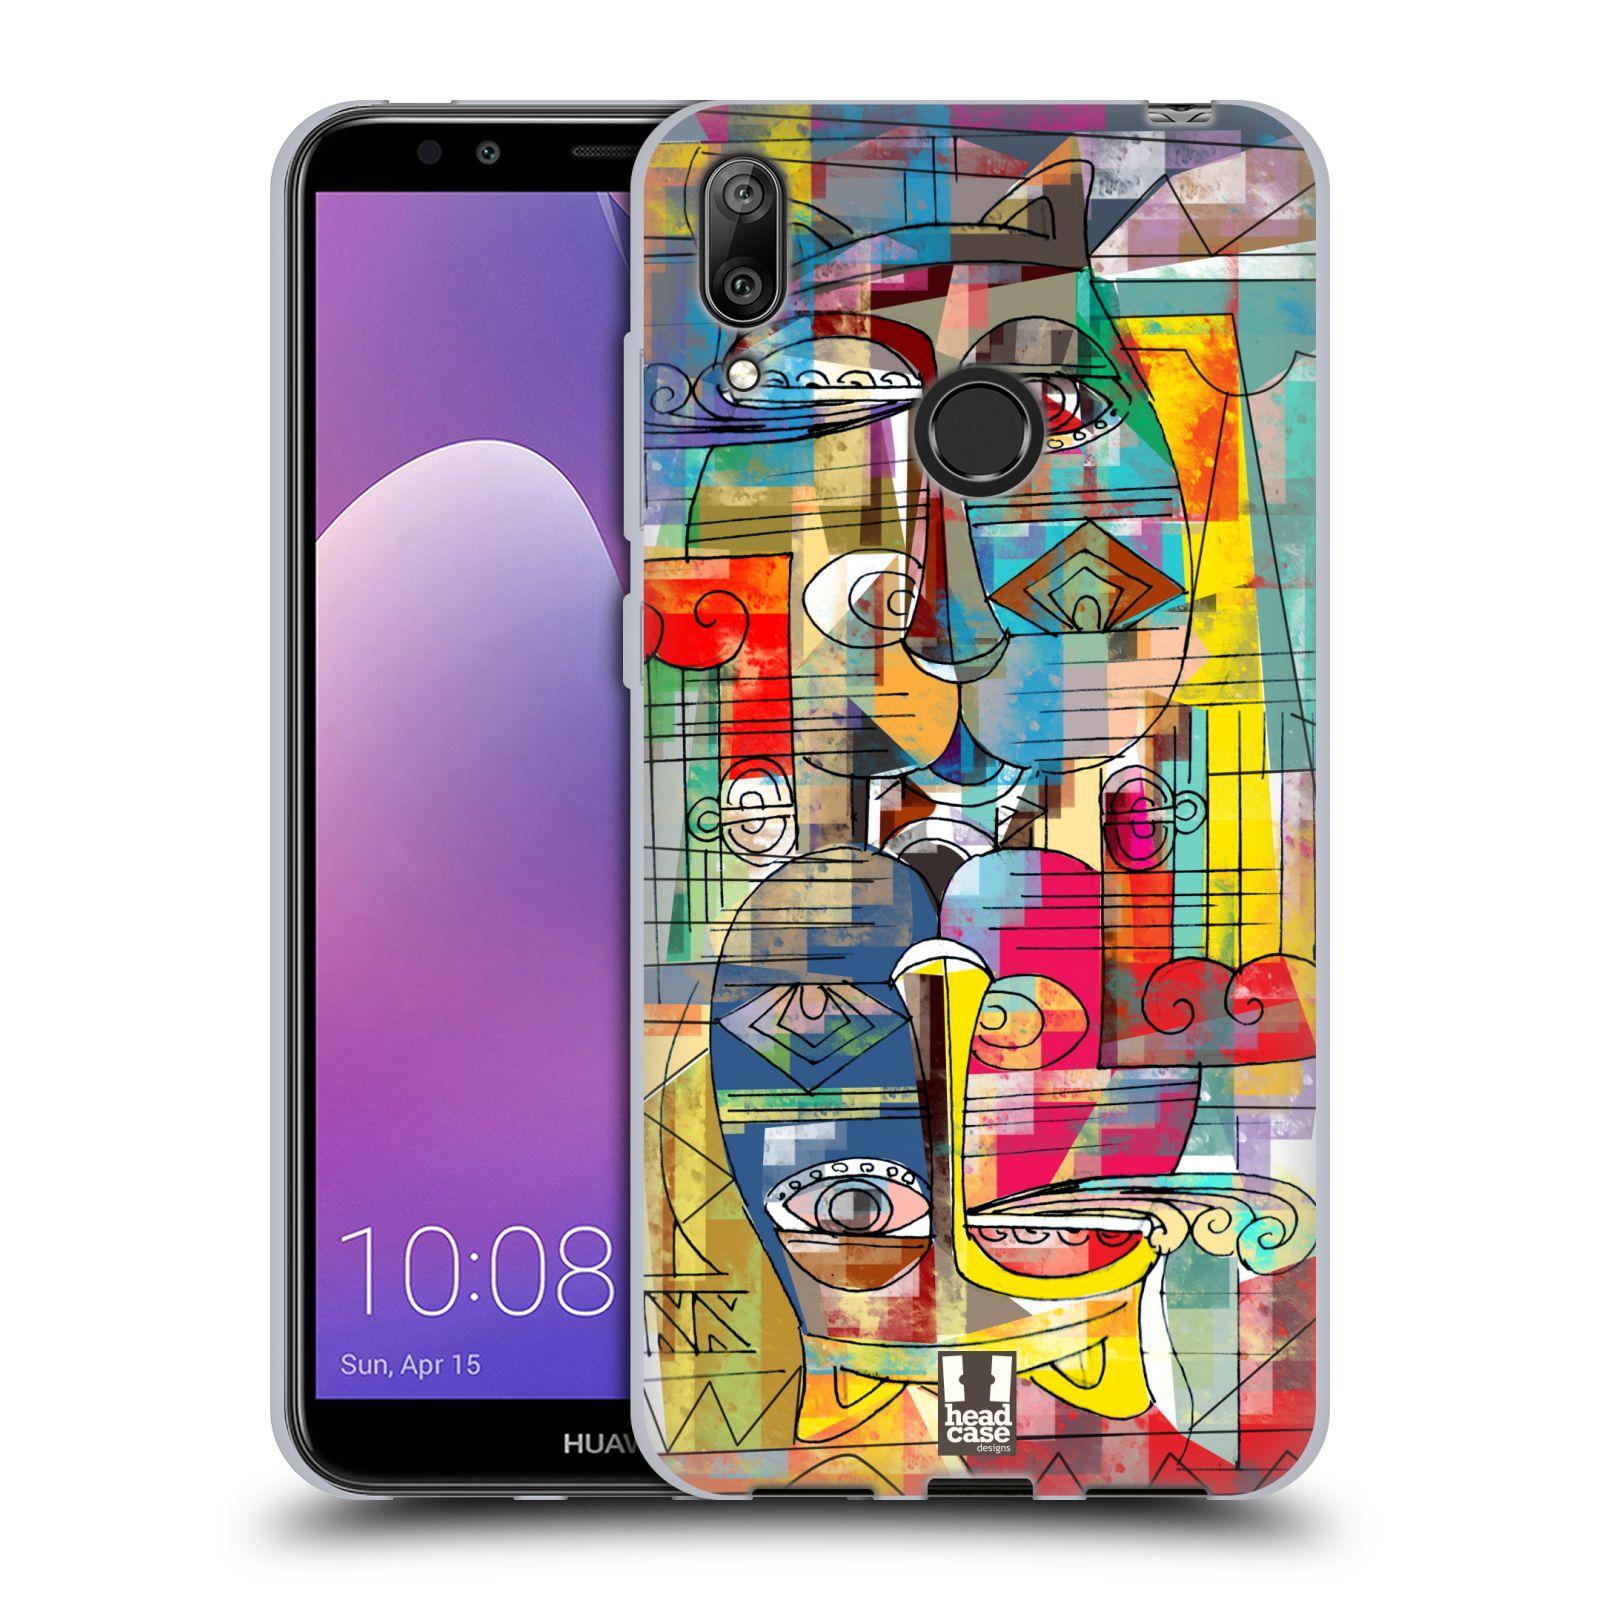 Silikonové pouzdro na mobil Huawei Y7 (2019) - Head Case - AZTEC MANX